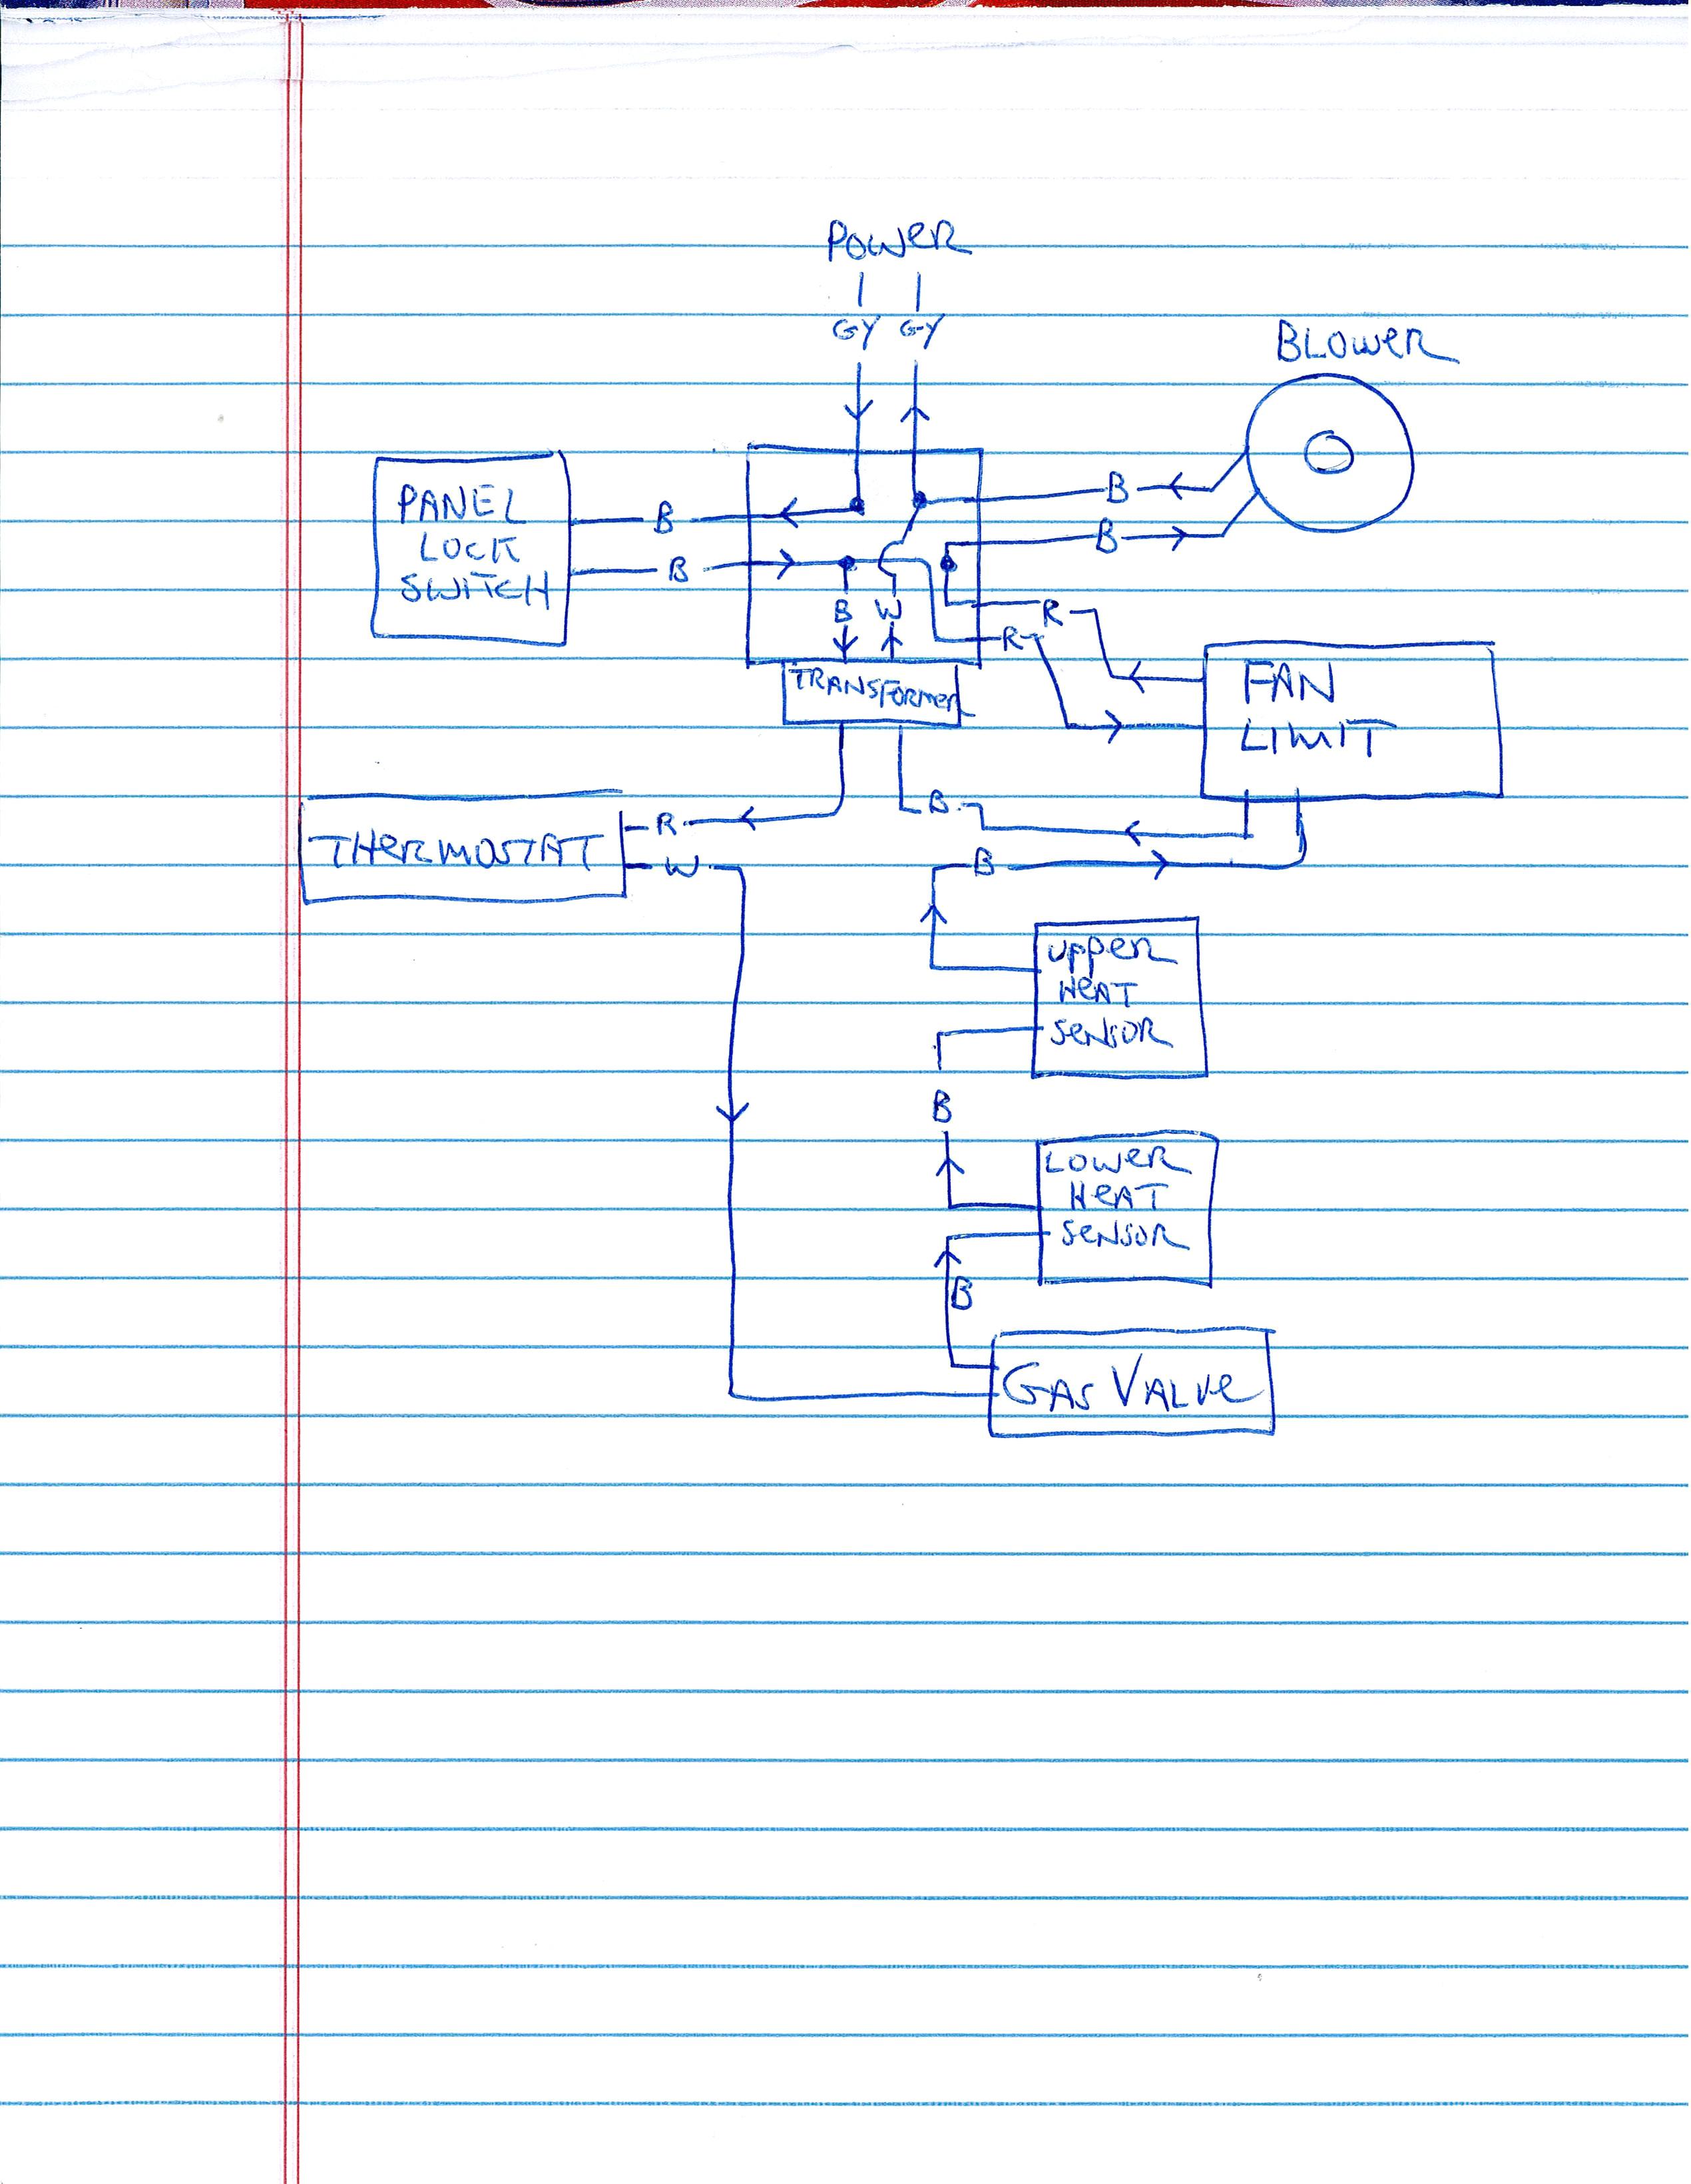 Honeywell Fan Limit Switch Wiring Diagram - Honeywell Fan Limit Switch Wiring Diagram